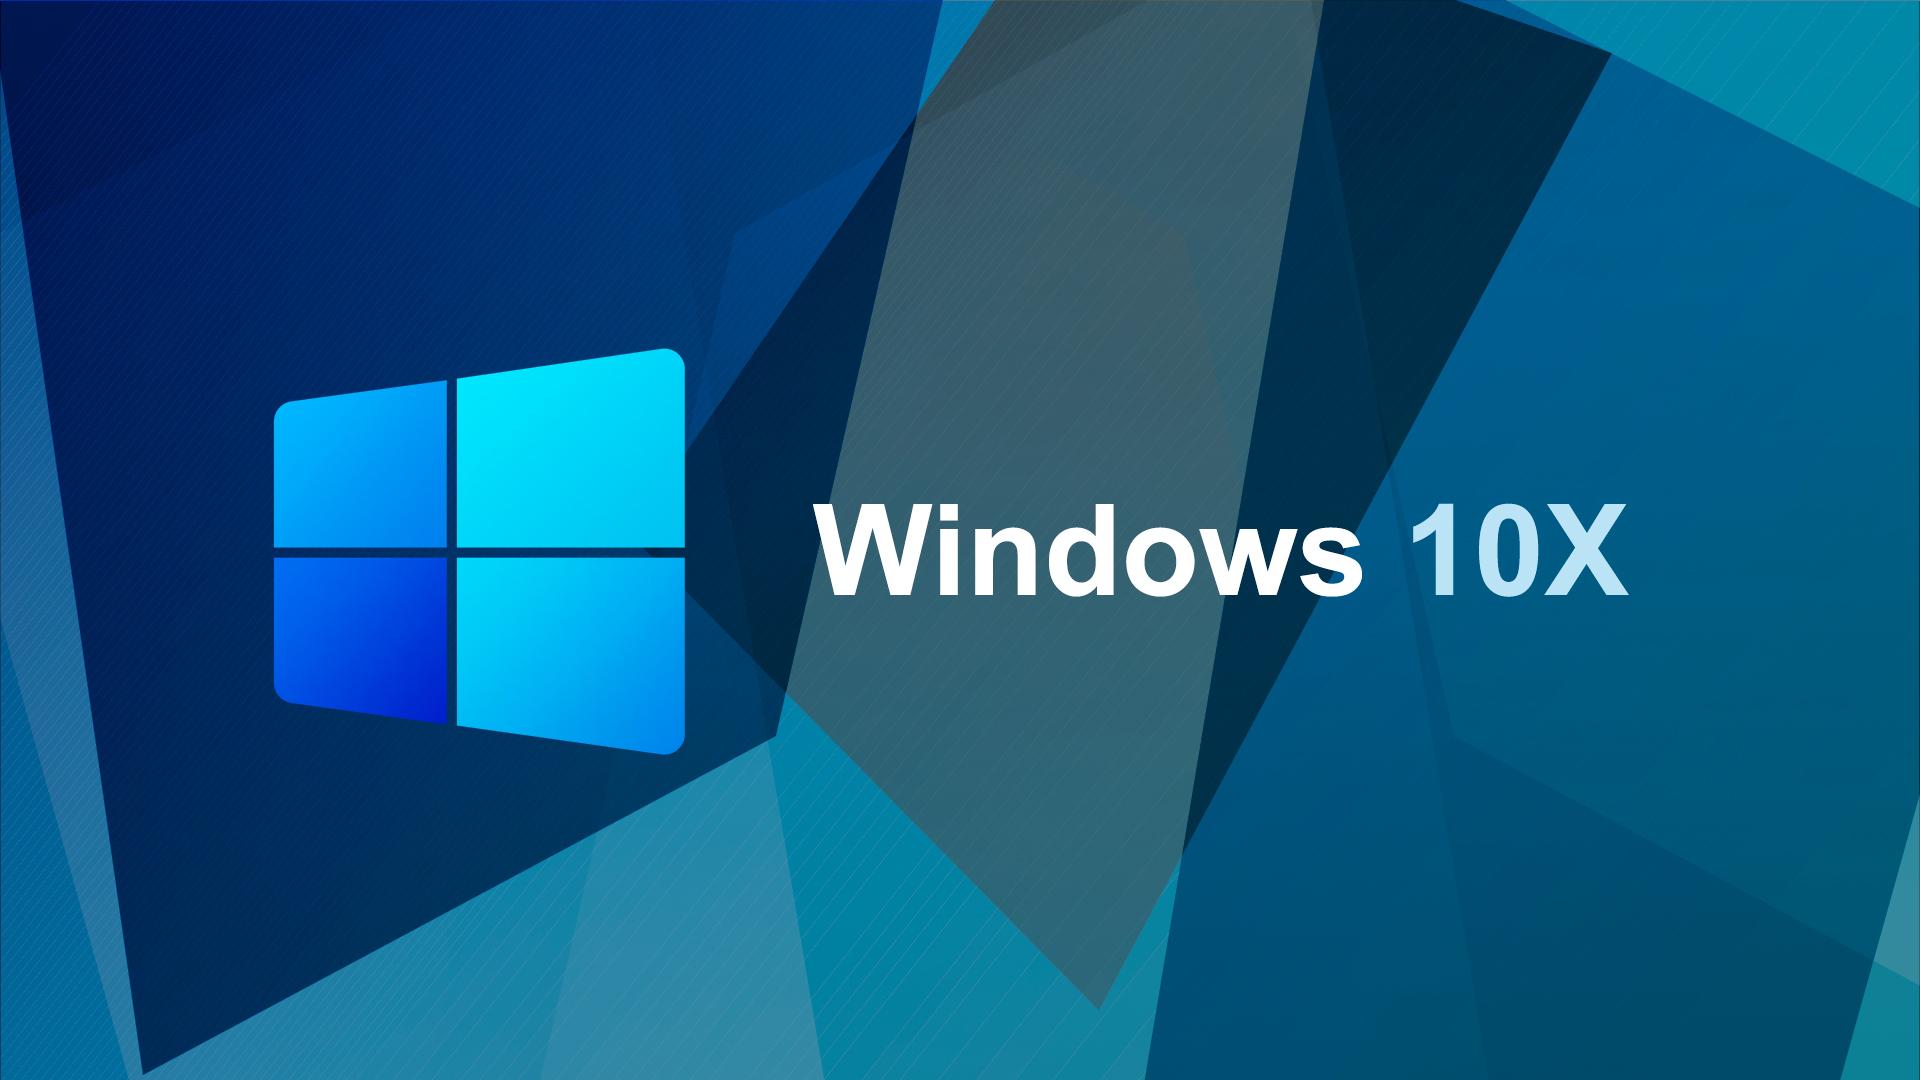 Microsoft, Windows 10, Windows Logo, Windows 10X, Windows On ARM, Windows 10 ARM, Windows 10 X, Windows 10X Logo, Microsoft Windows 10 X, Microsoft Windows 10X, Geometric Art Style